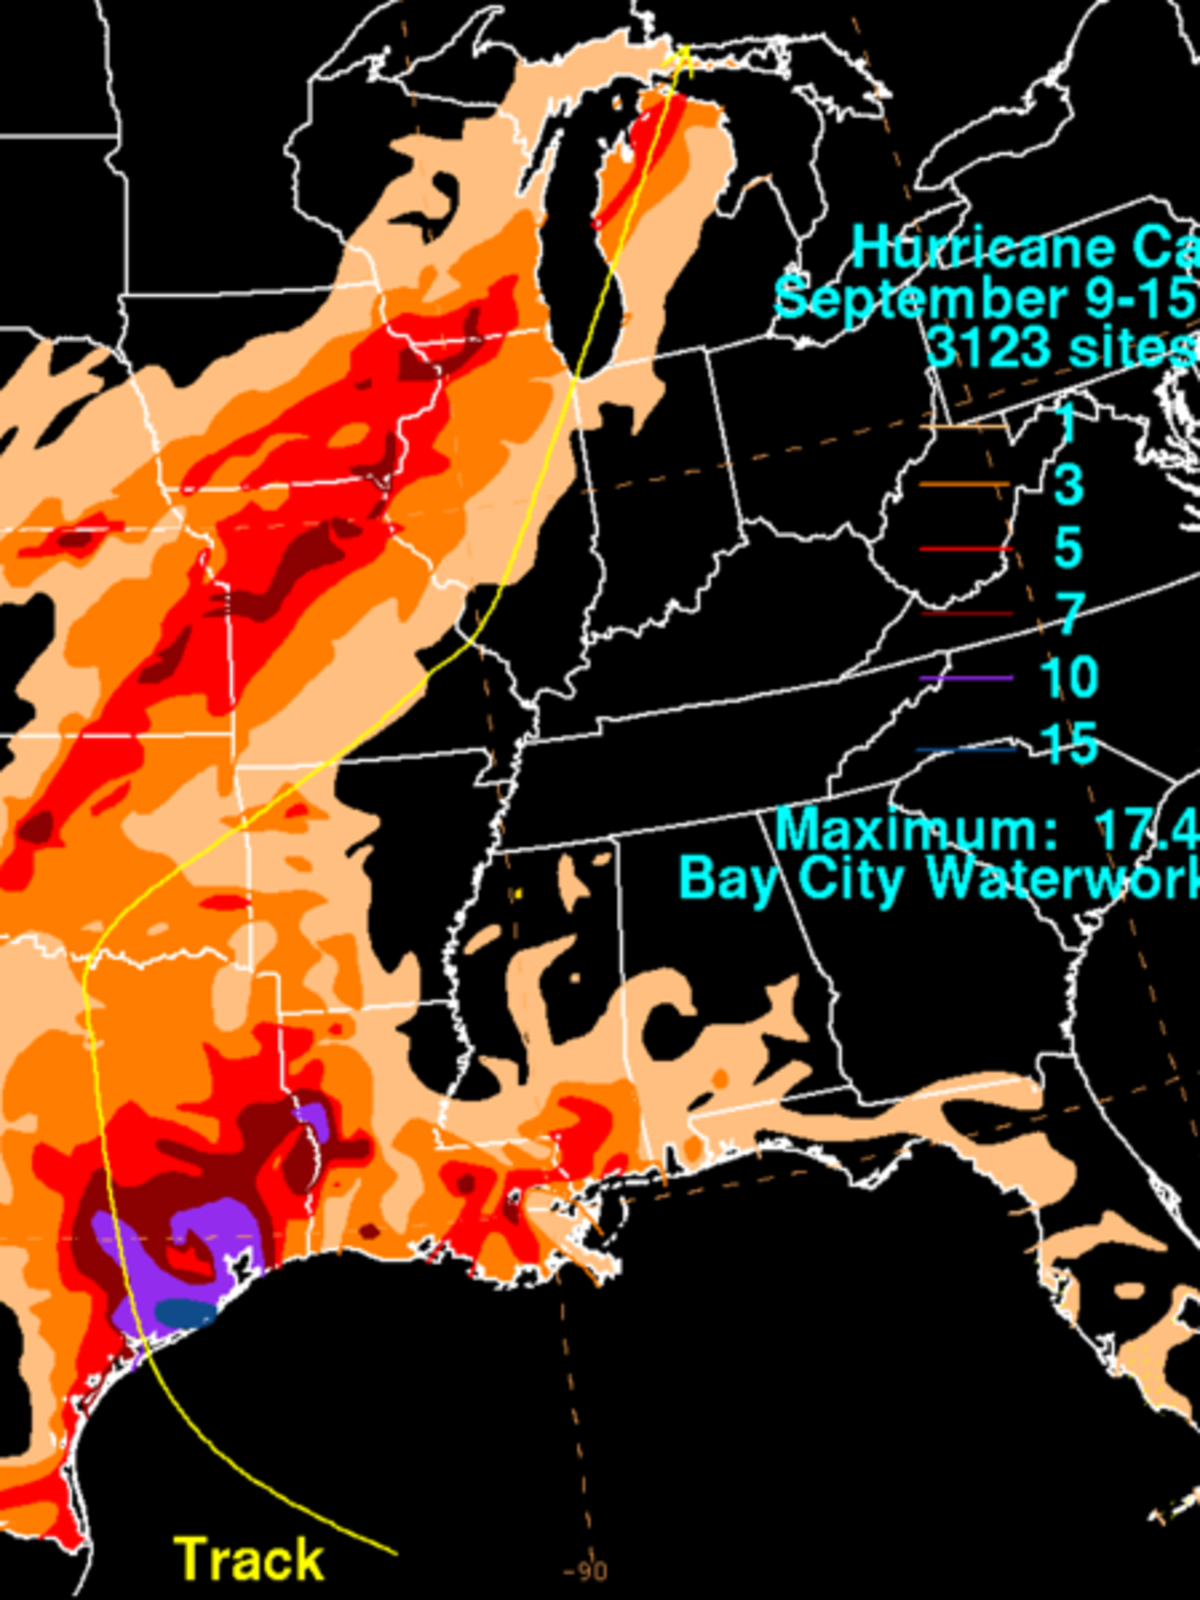 Hurricane Carla rainfall map